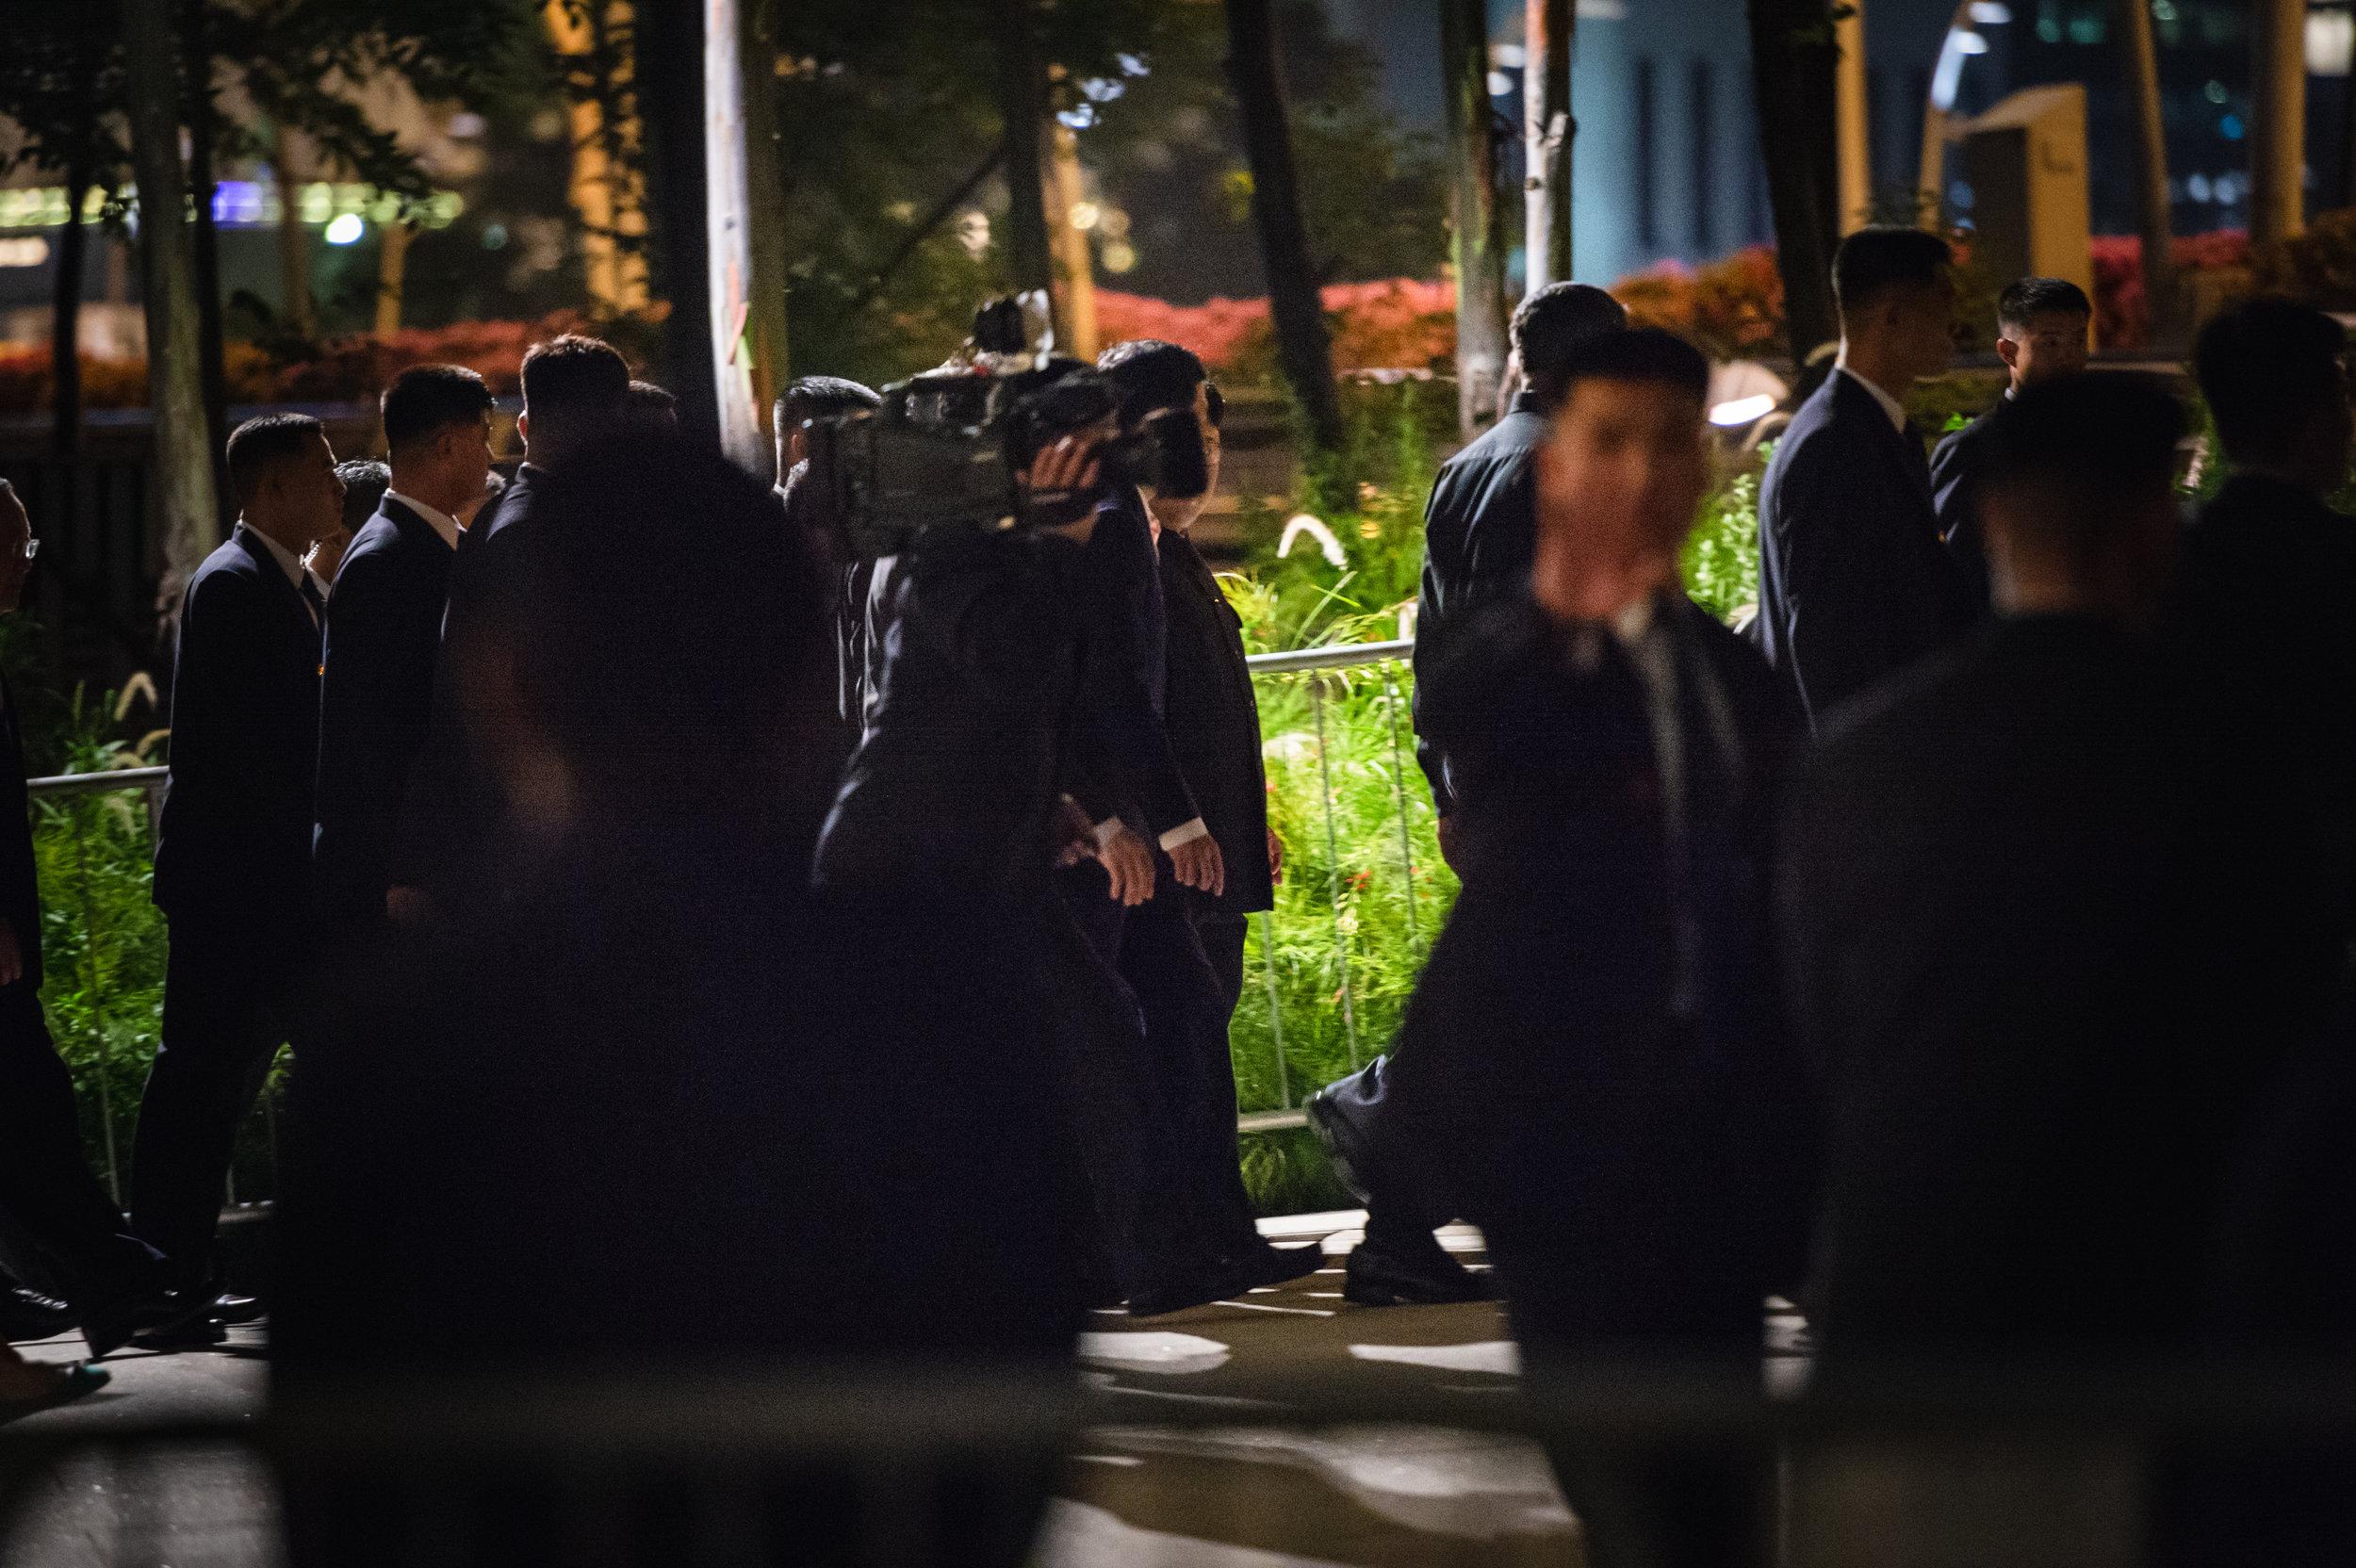 2018-06-11 - The Coincidental Kim Jong Un Esplanade Visit (8 of 11).jpg